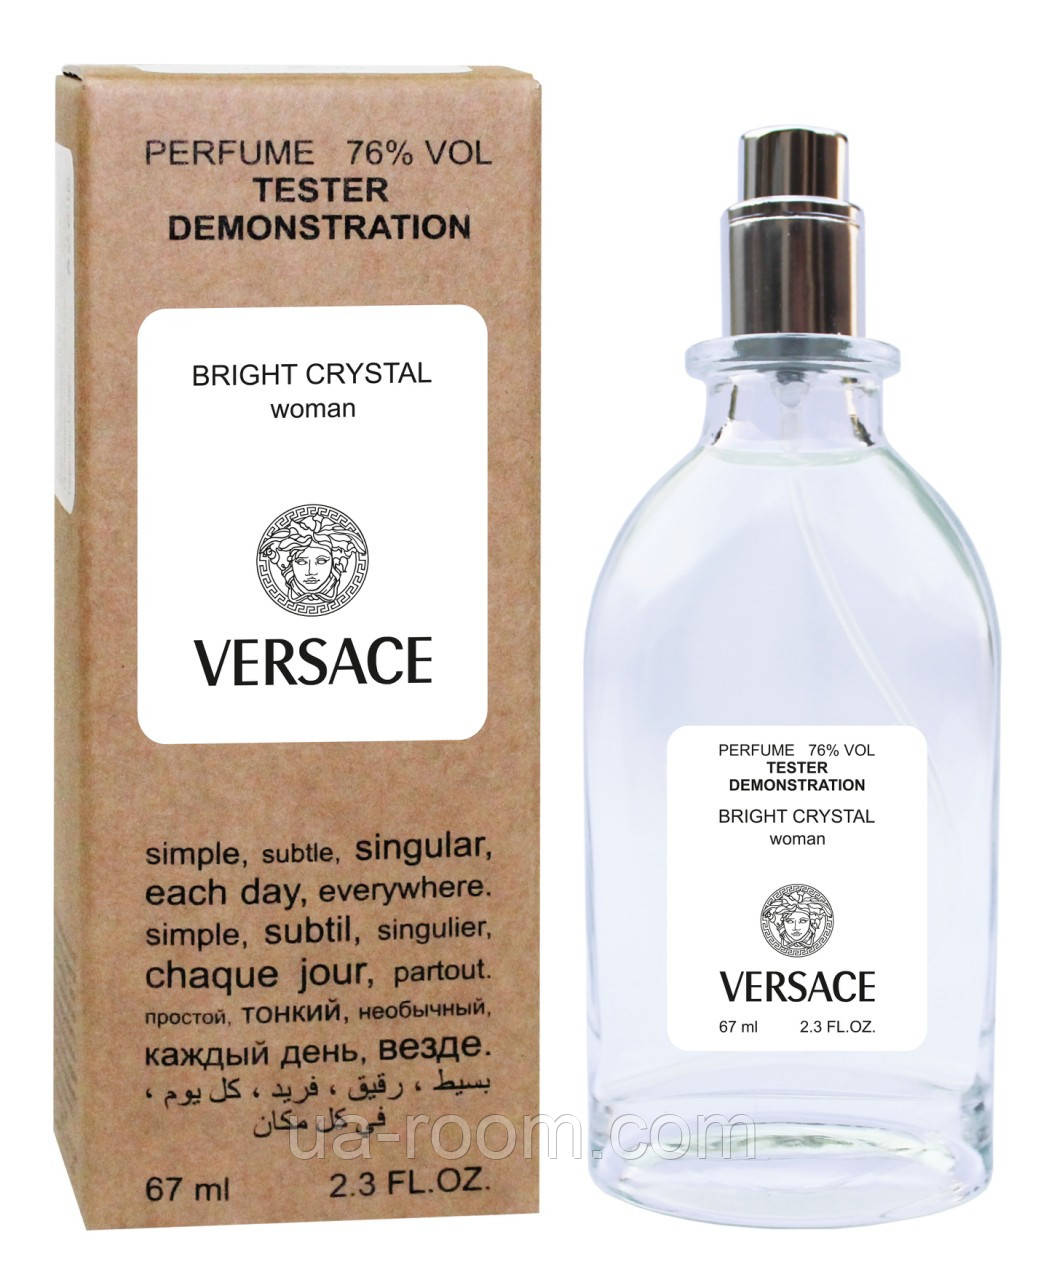 Тестер женский Versace Bright Crystal, 67 мл.